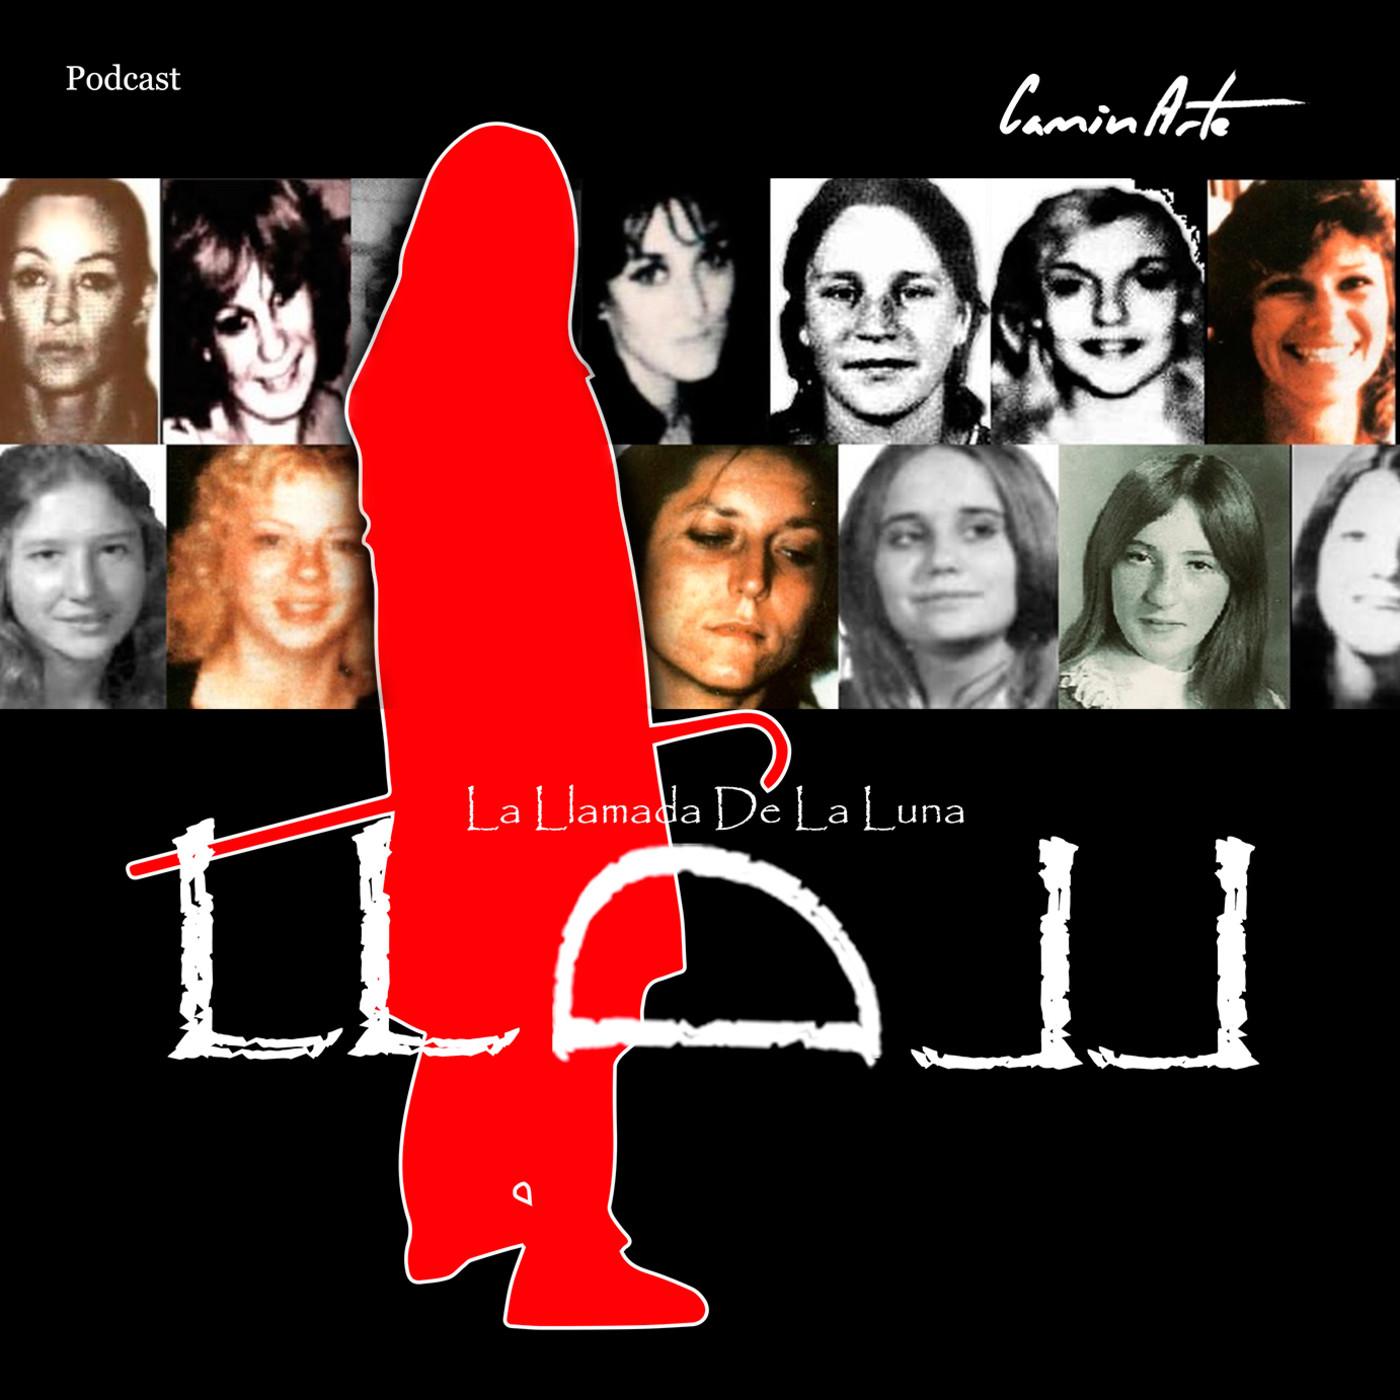 78 (LLDLL) Cazador de Prostitutas. Robert Hansen